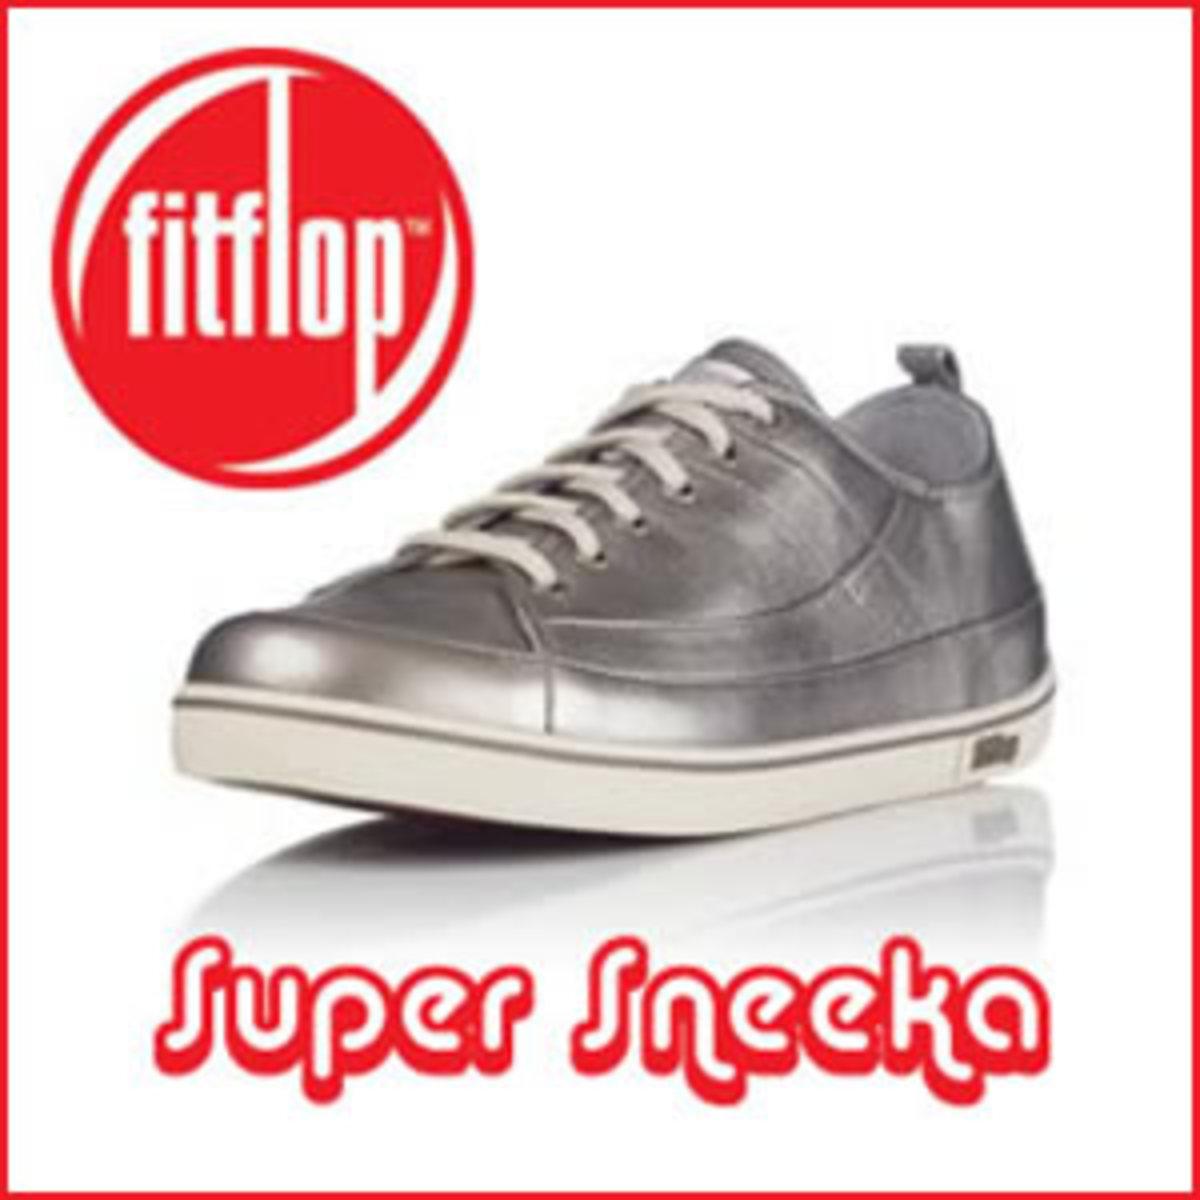 The FitFlop Super Sneeka